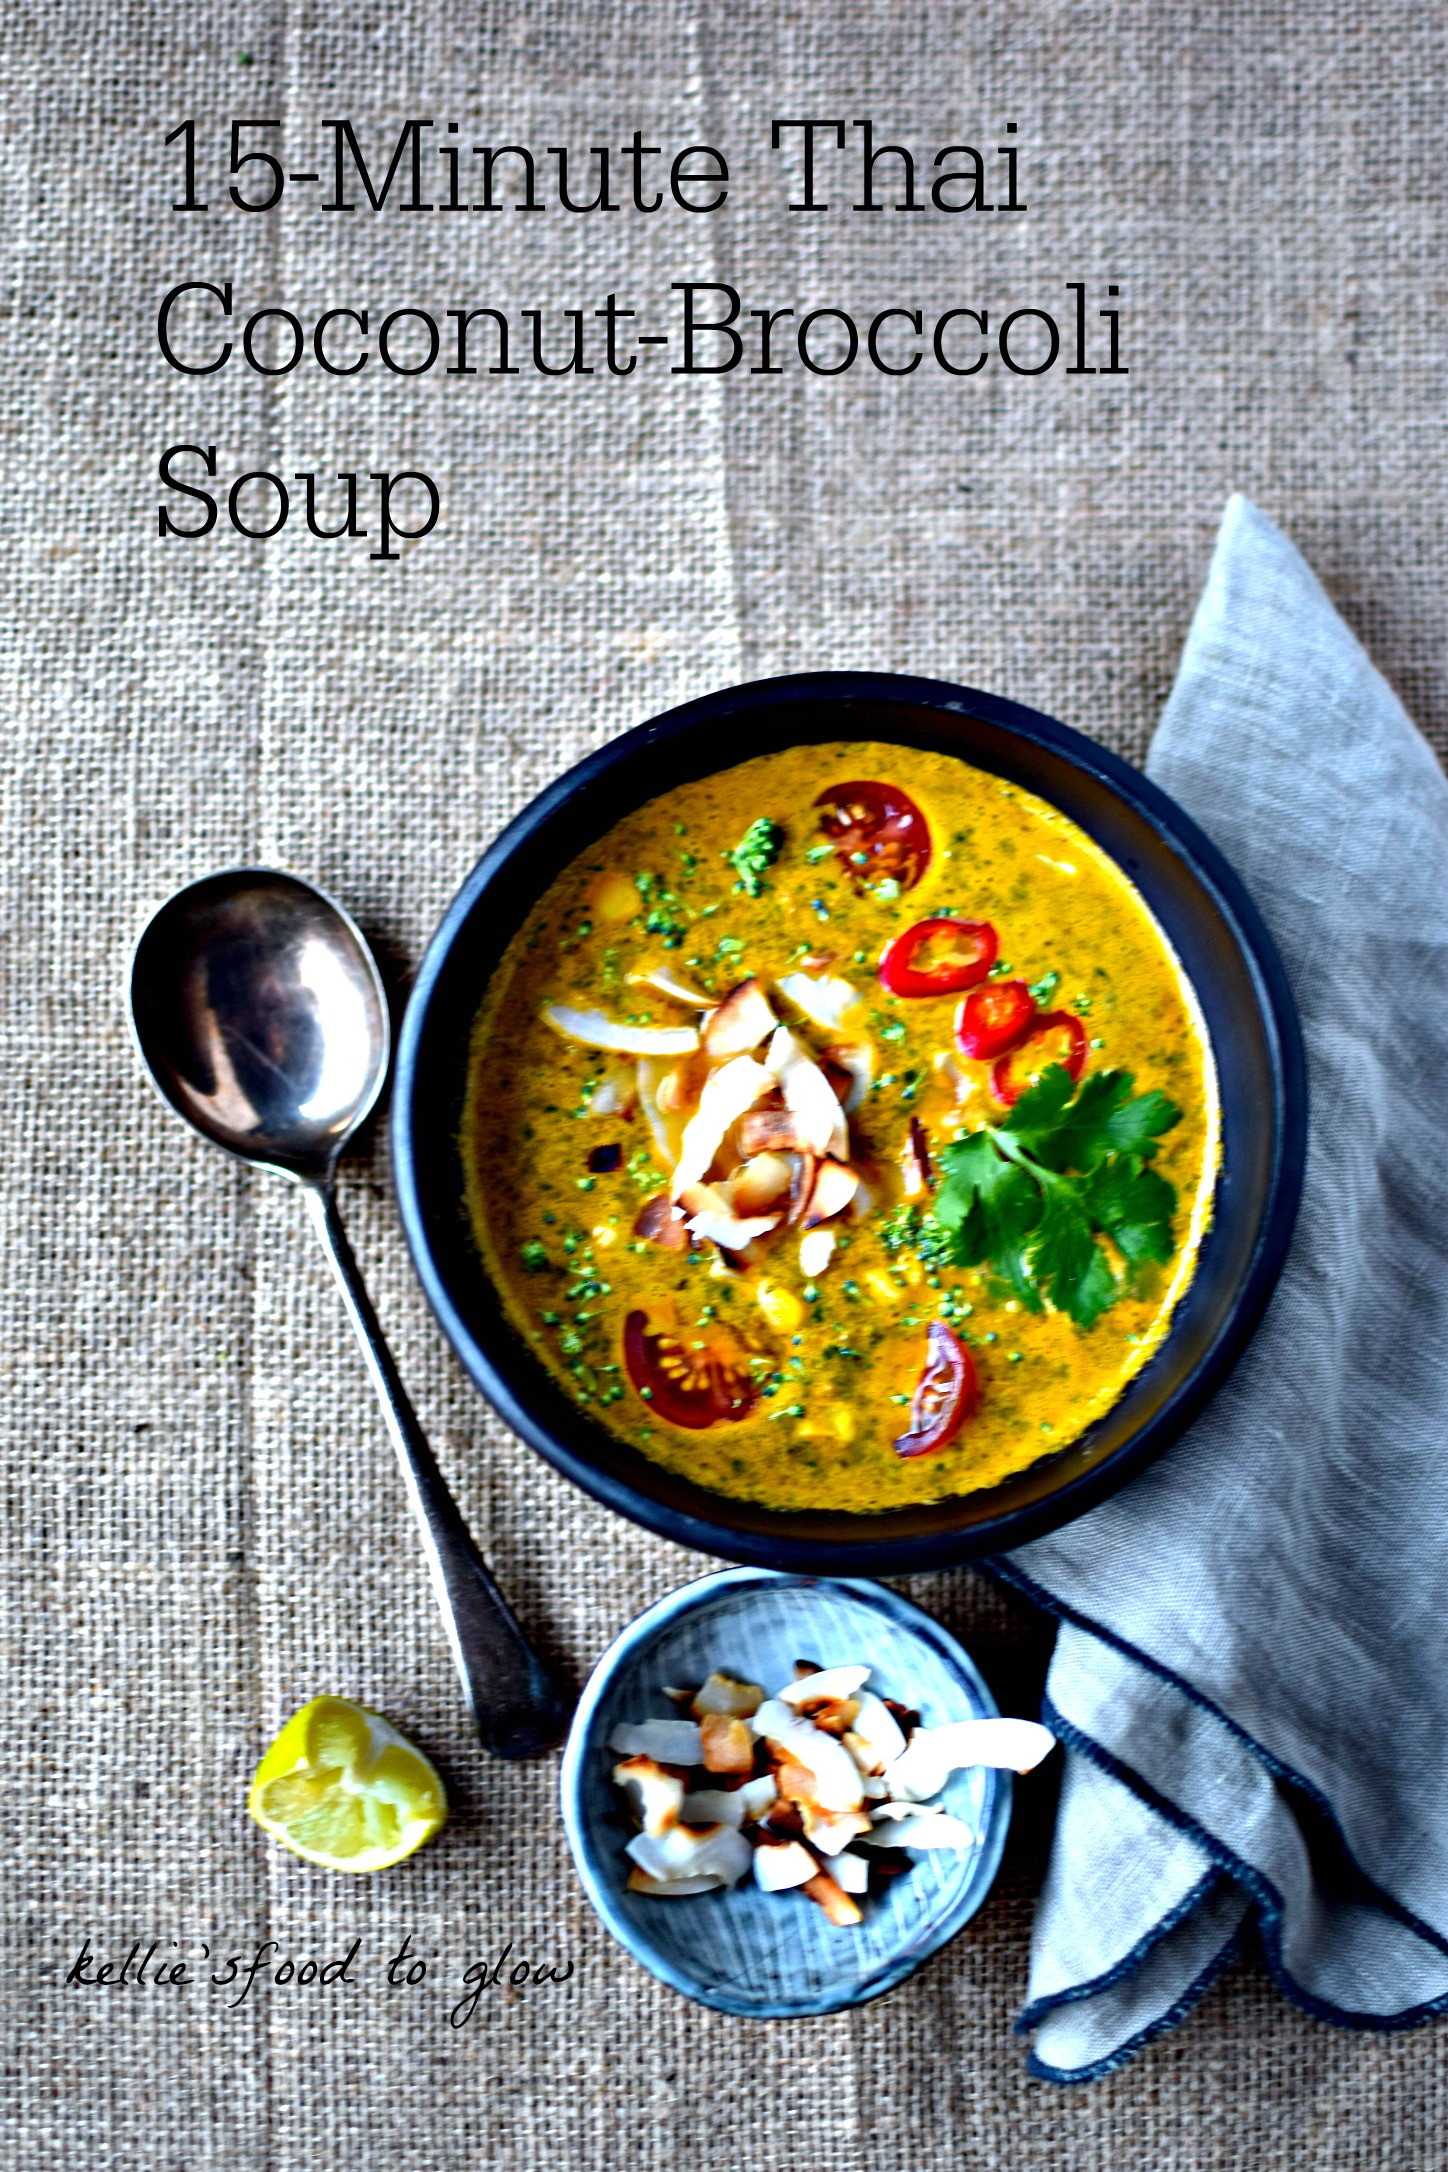 15-Minute Thai Coconut-Broccoli Soup Recipe food to glow